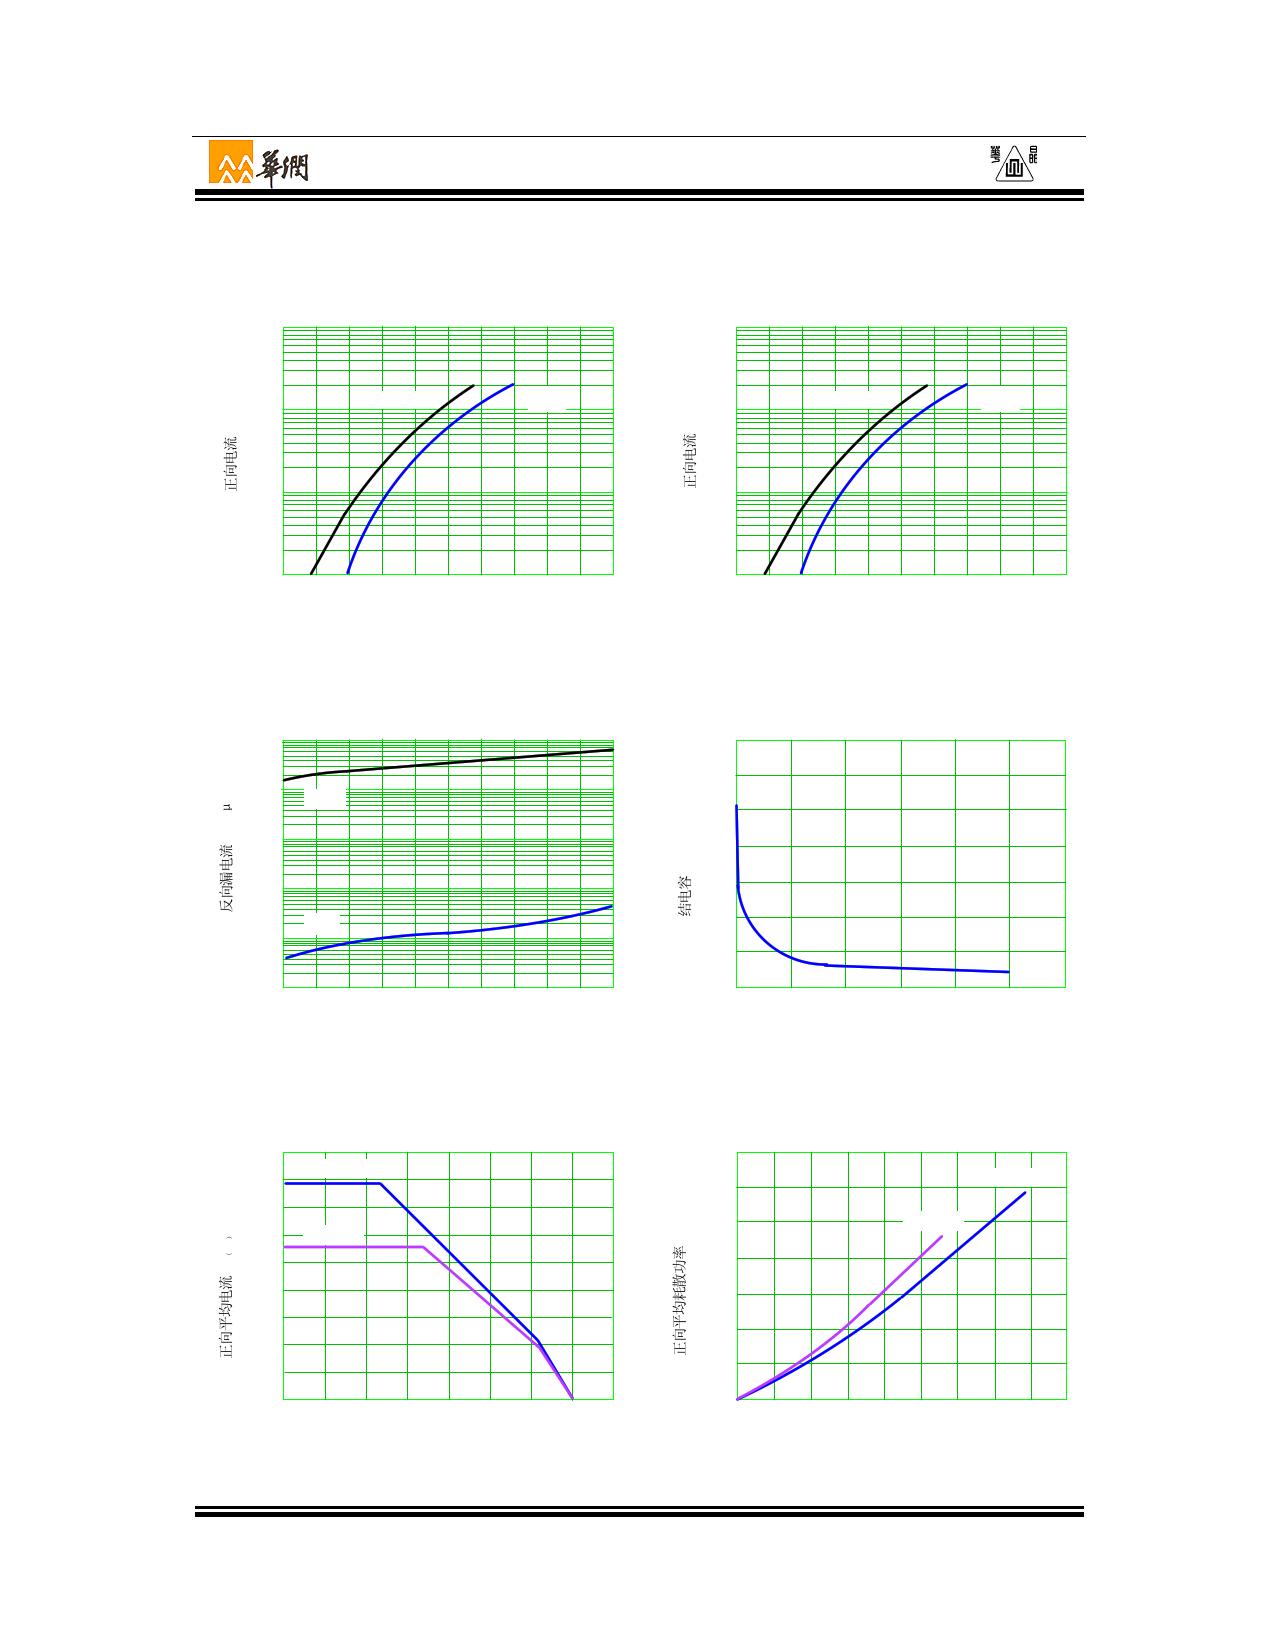 2CZ20100A4S pdf, ピン配列